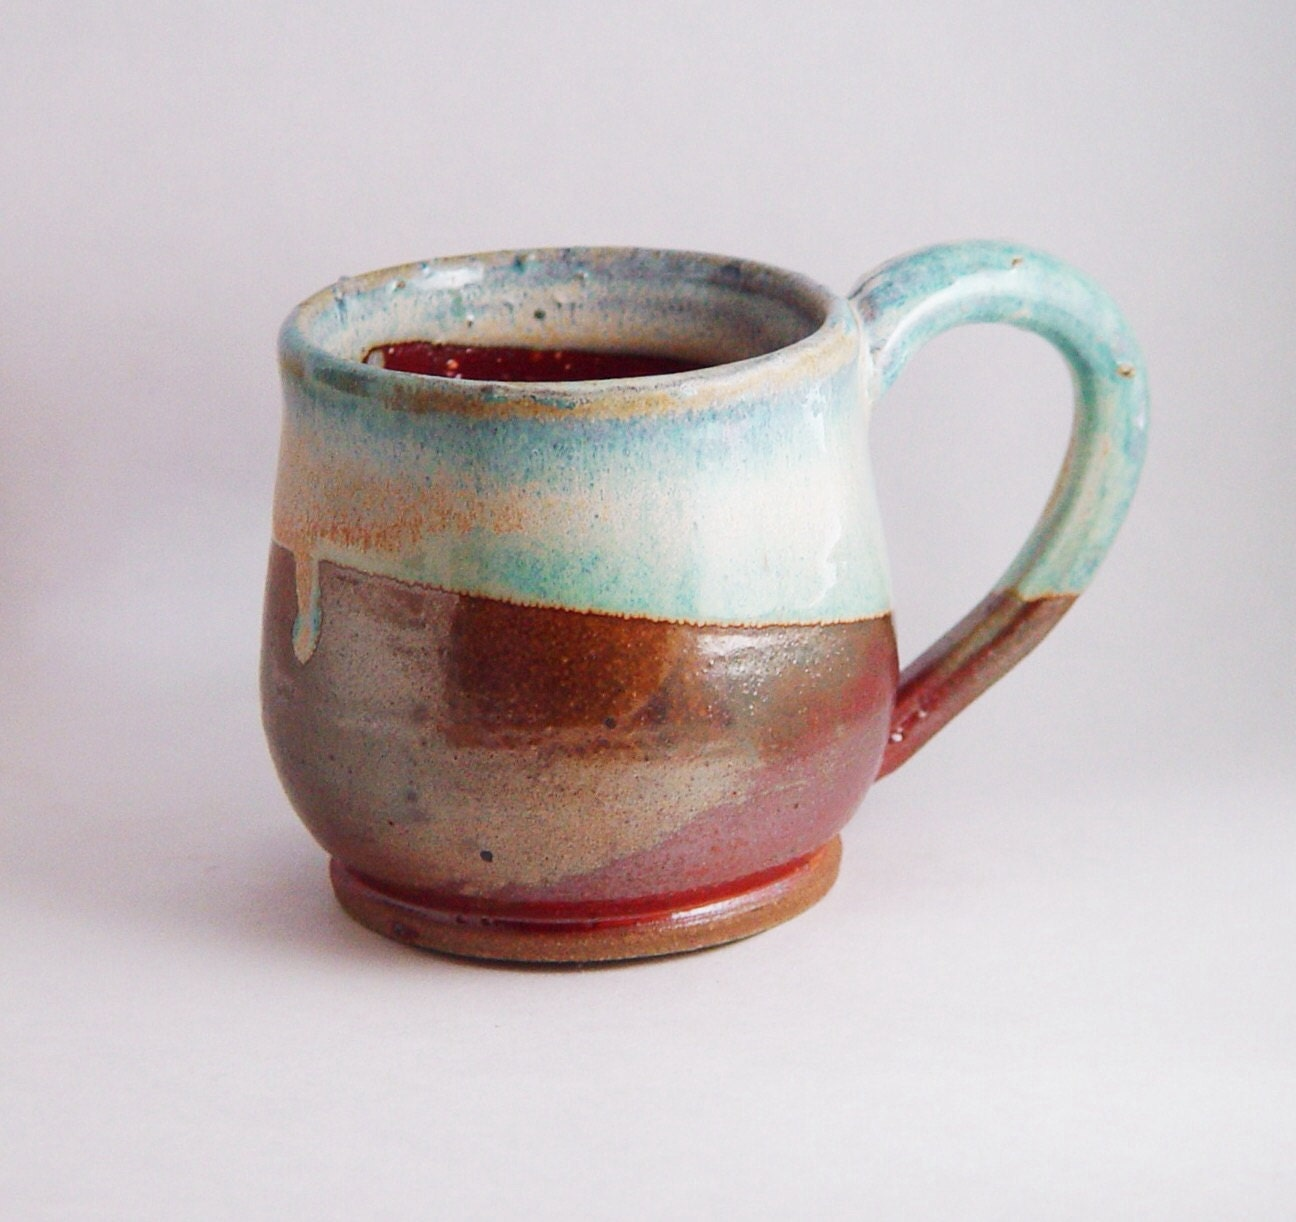 Unique Coffee Mug Tea Cup Large Handled 10 Ounce Oz Pottery